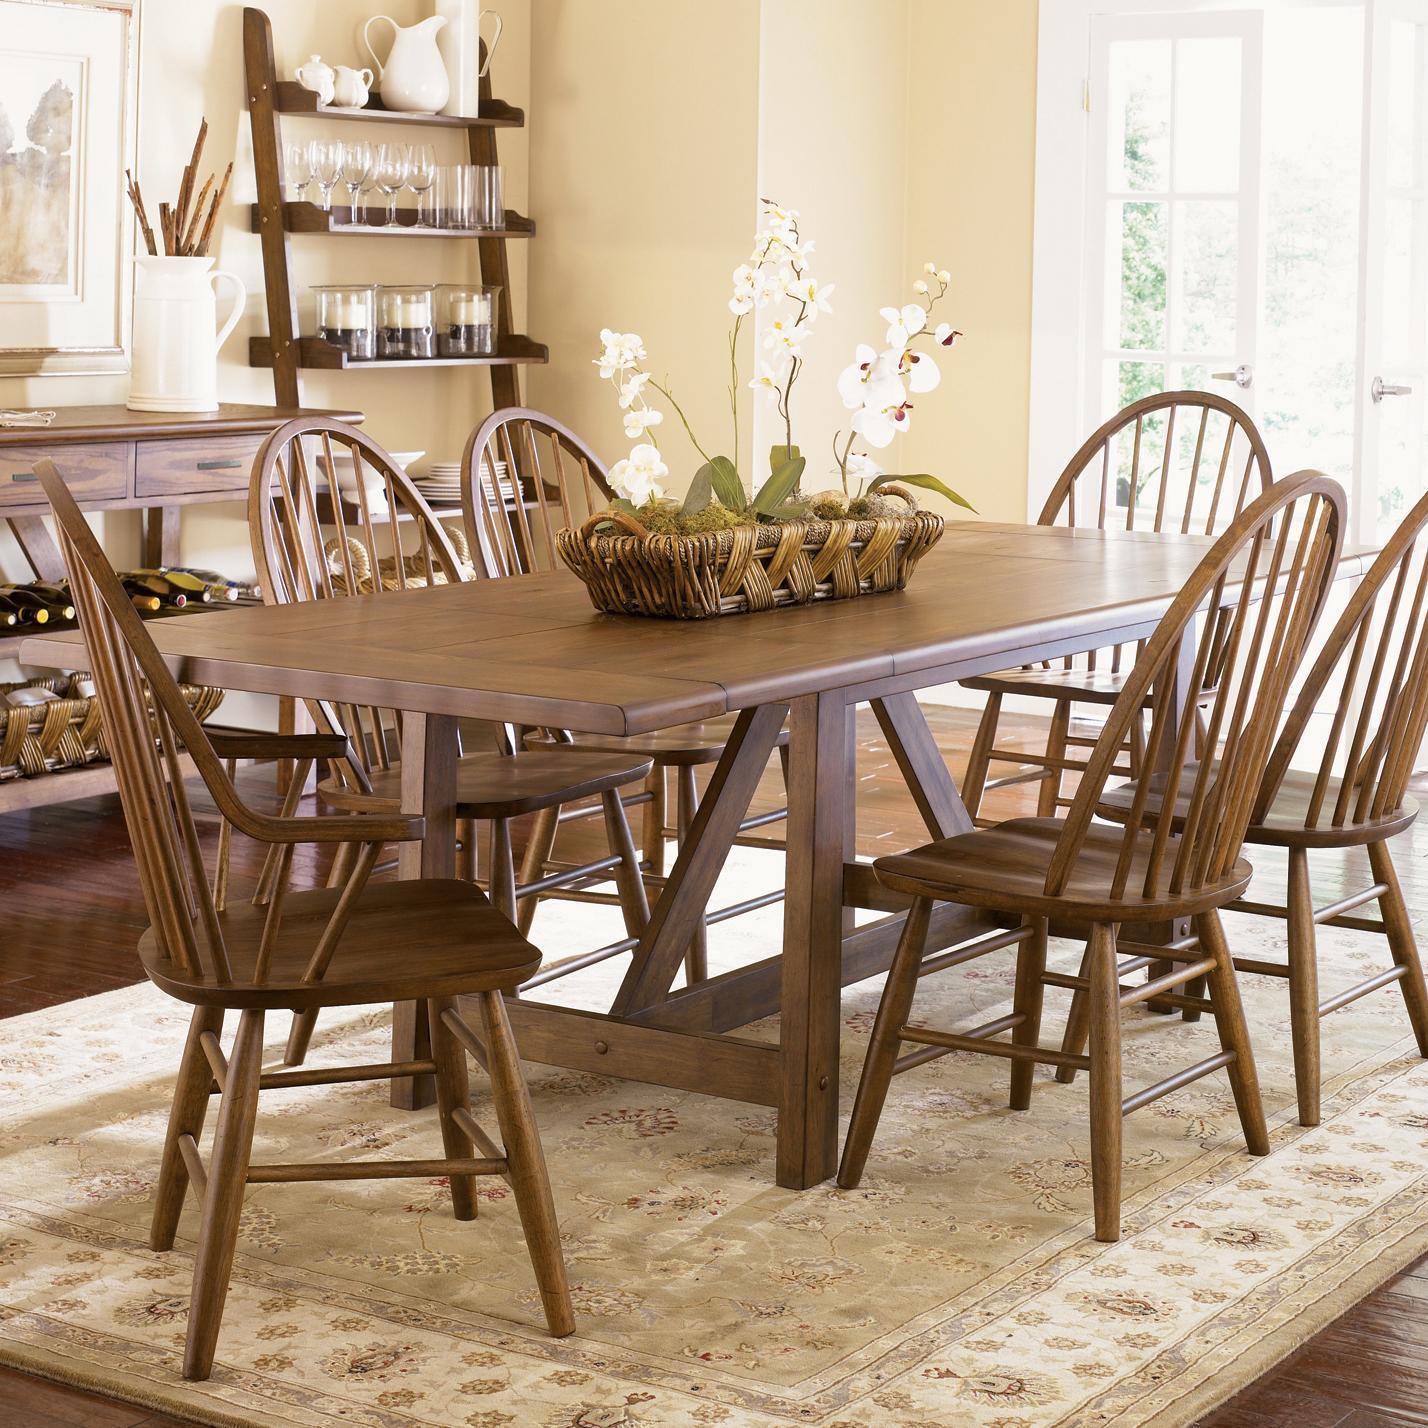 Liberty Furniture Farmhouse  Trestle Table - Item Number: 139-T4002